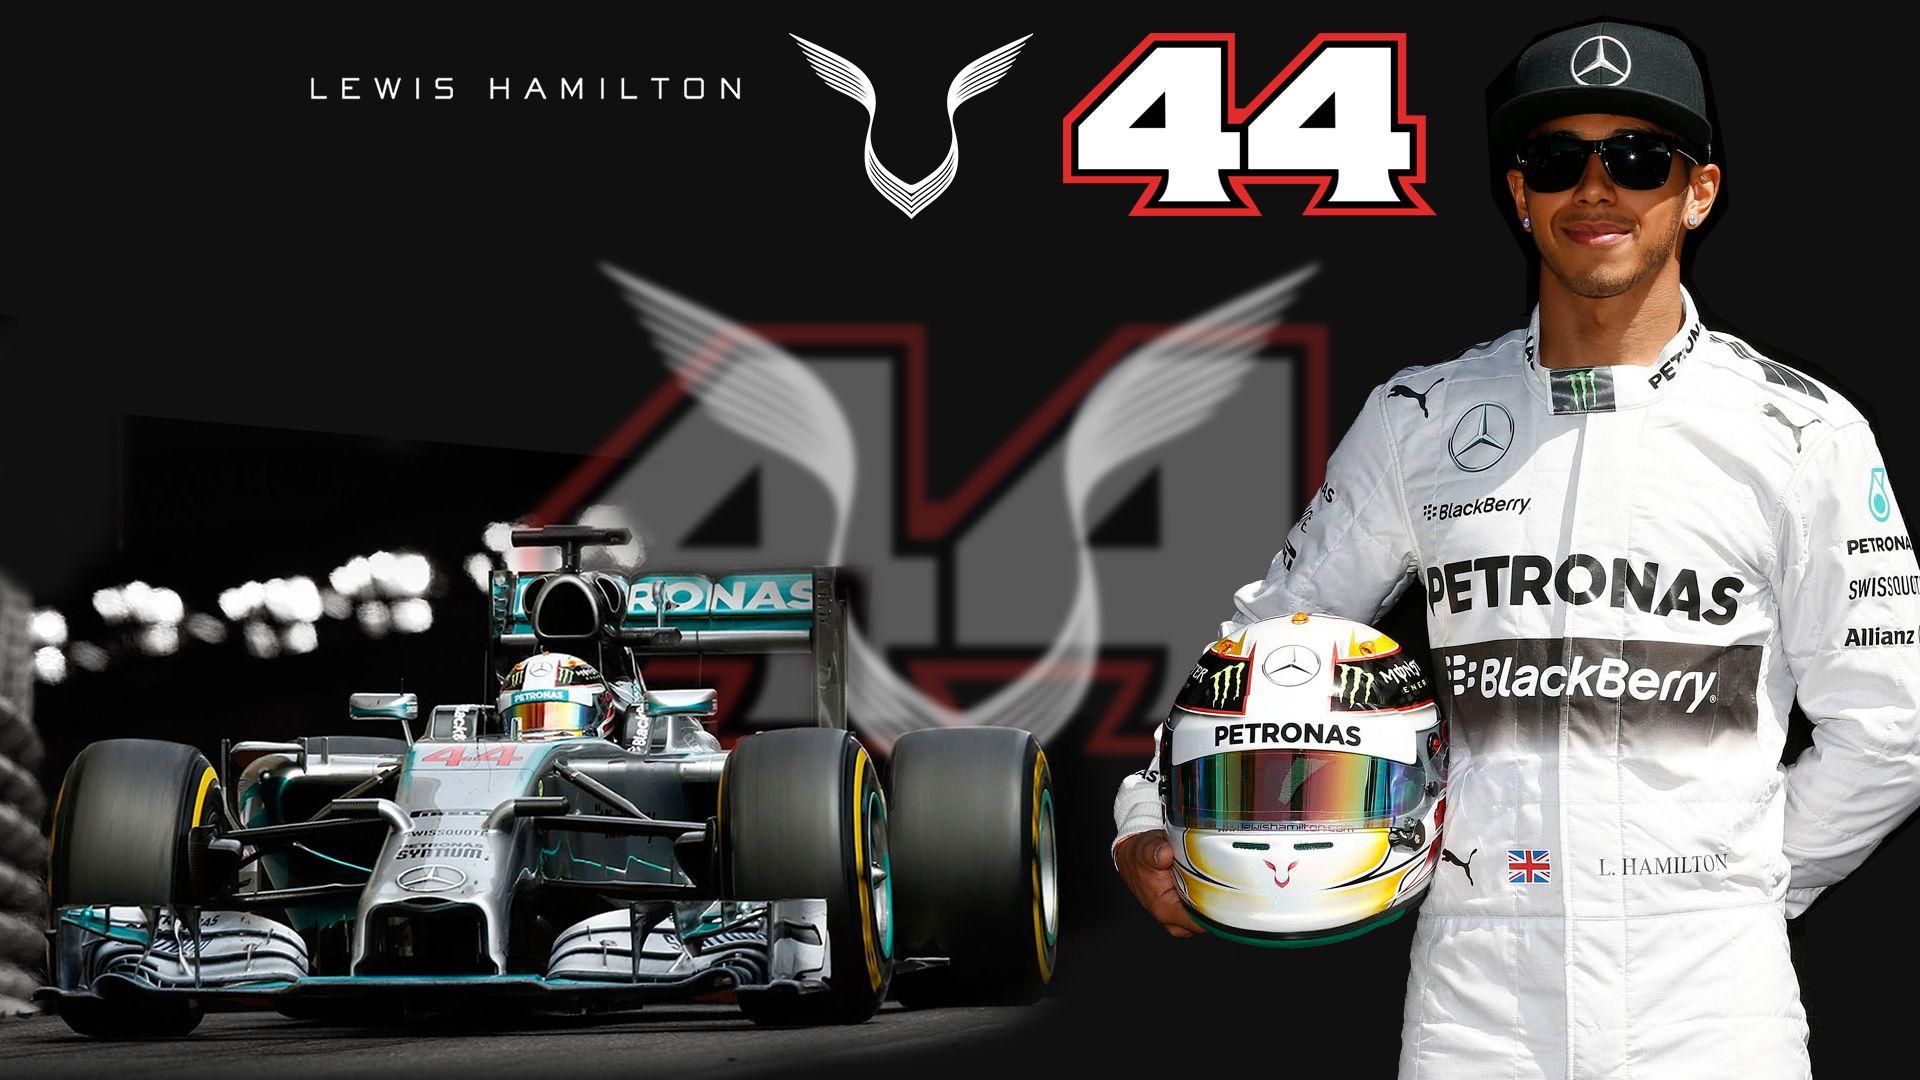 Lewis Hamilton Wallpapers